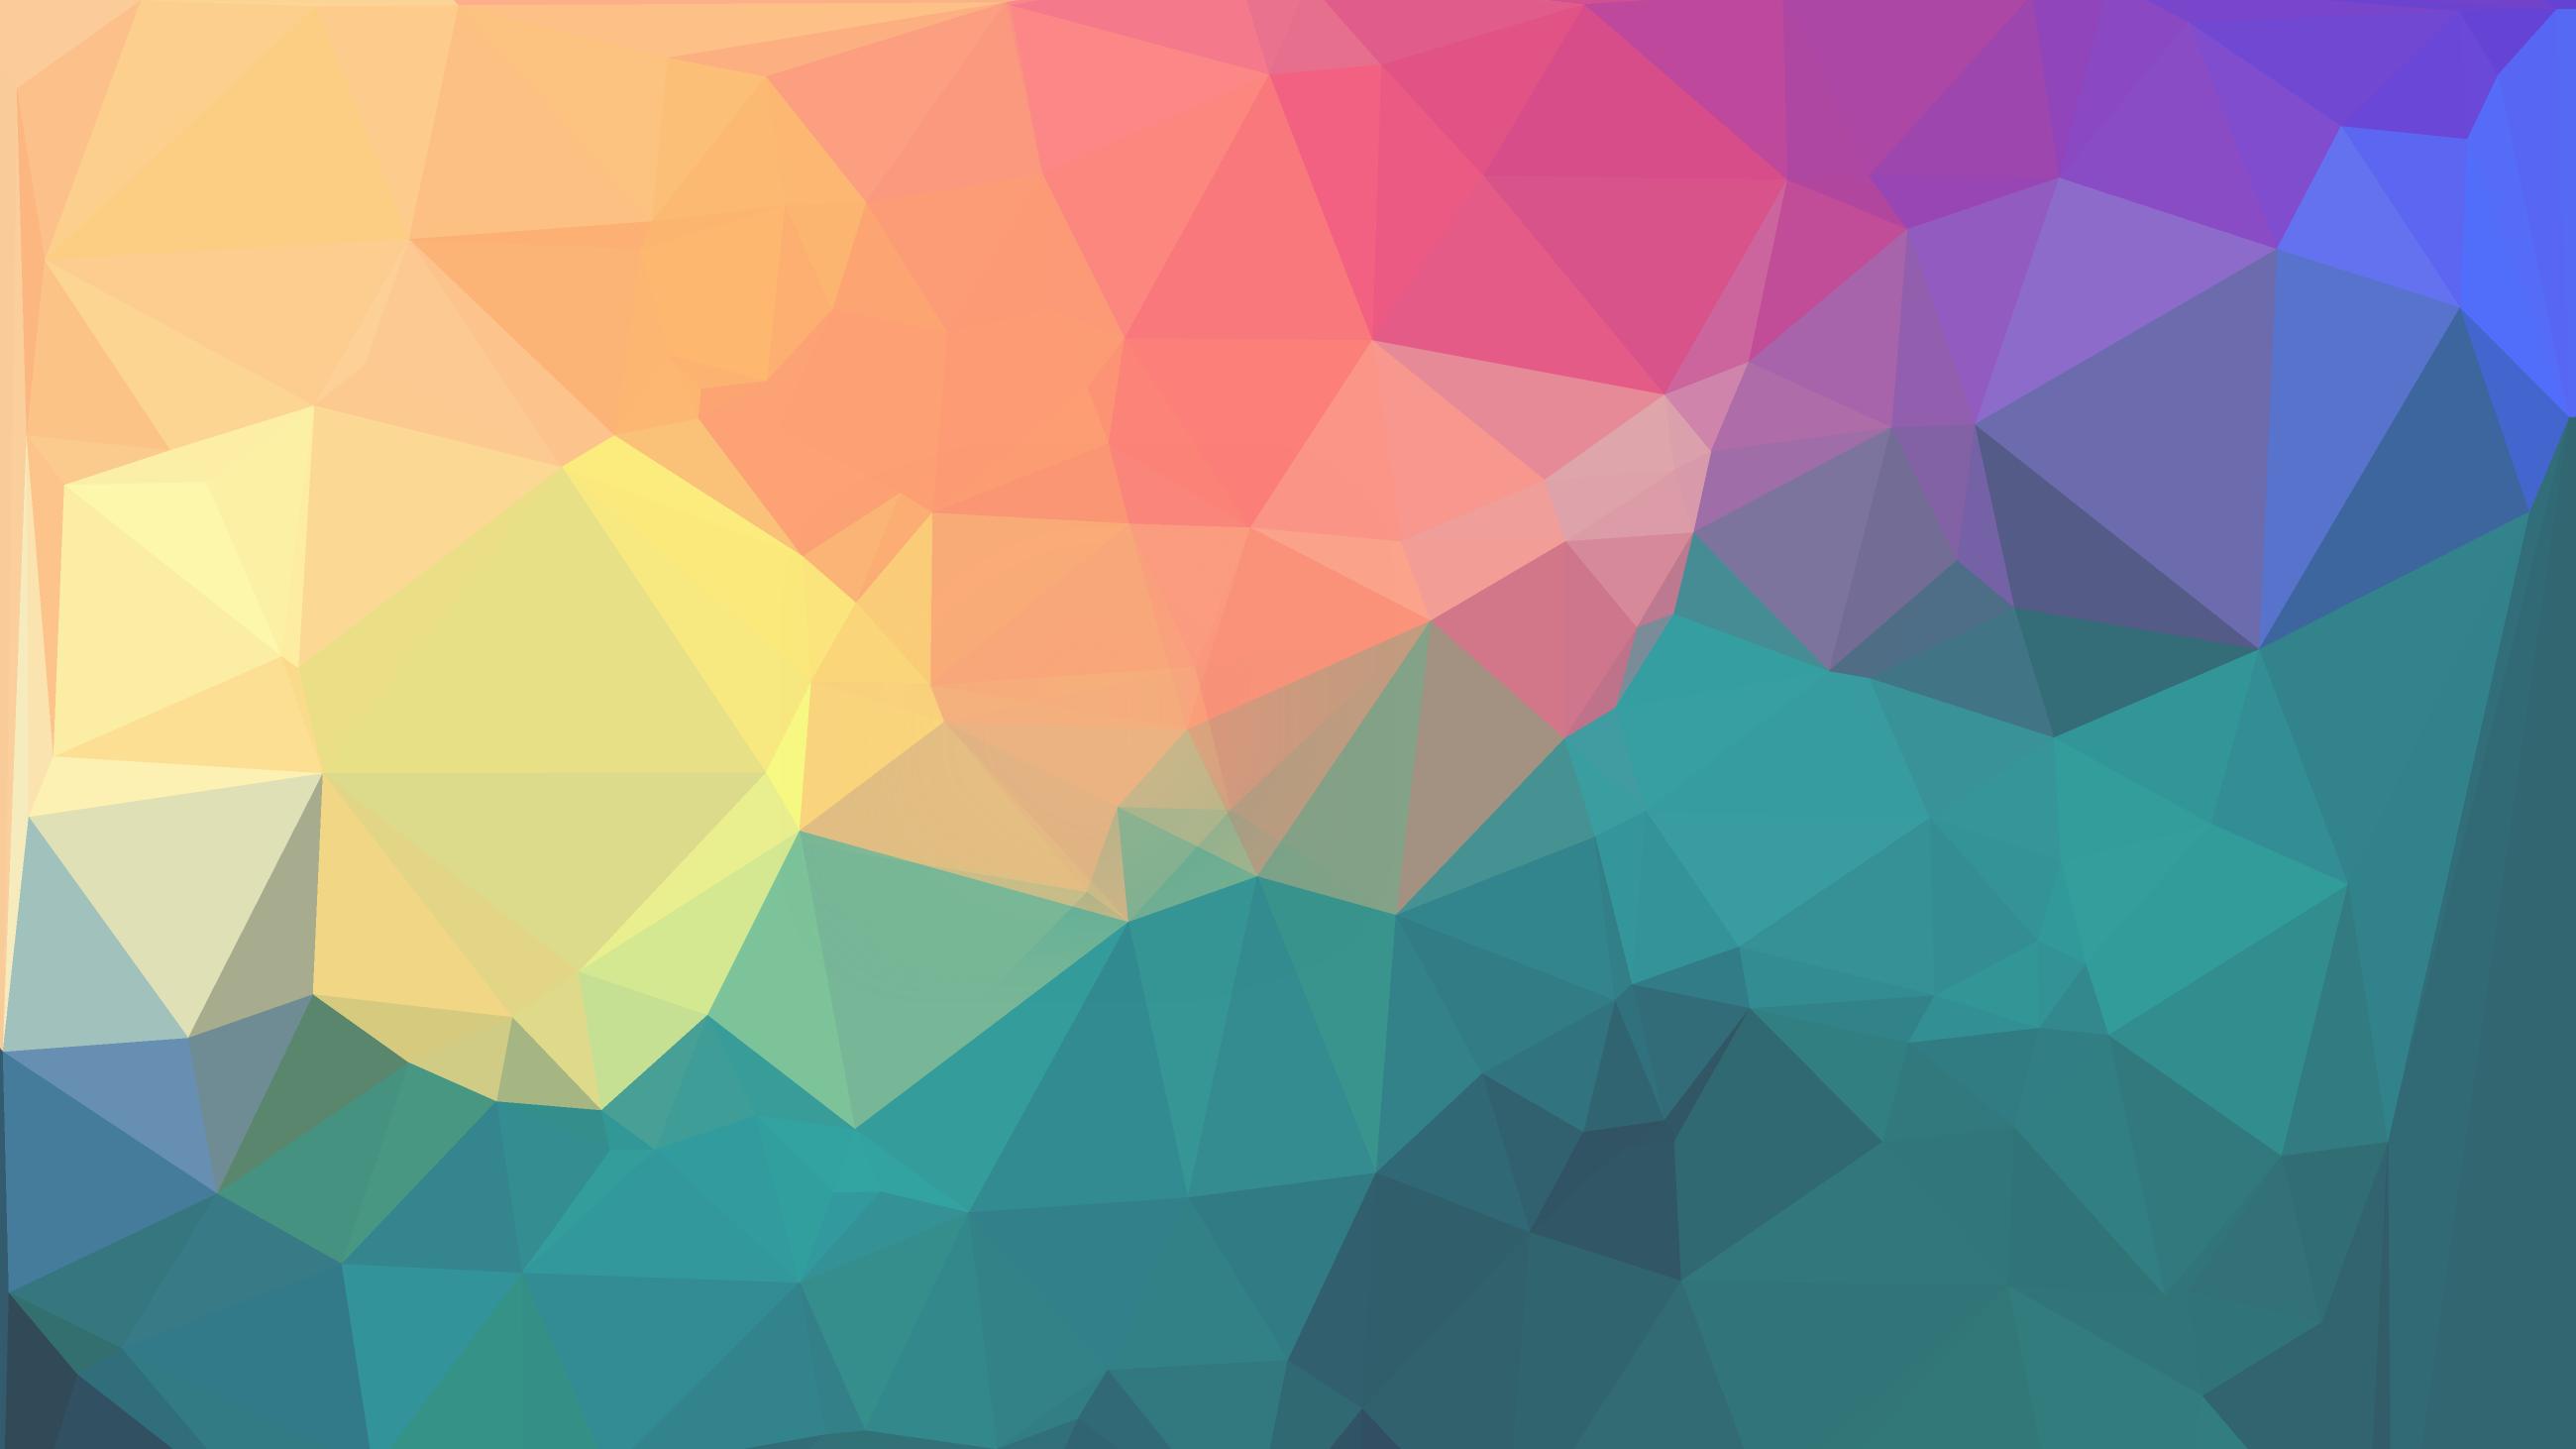 Geometric Desktop Backgrounds (25 Wallpapers) - Adorable Wallpapers